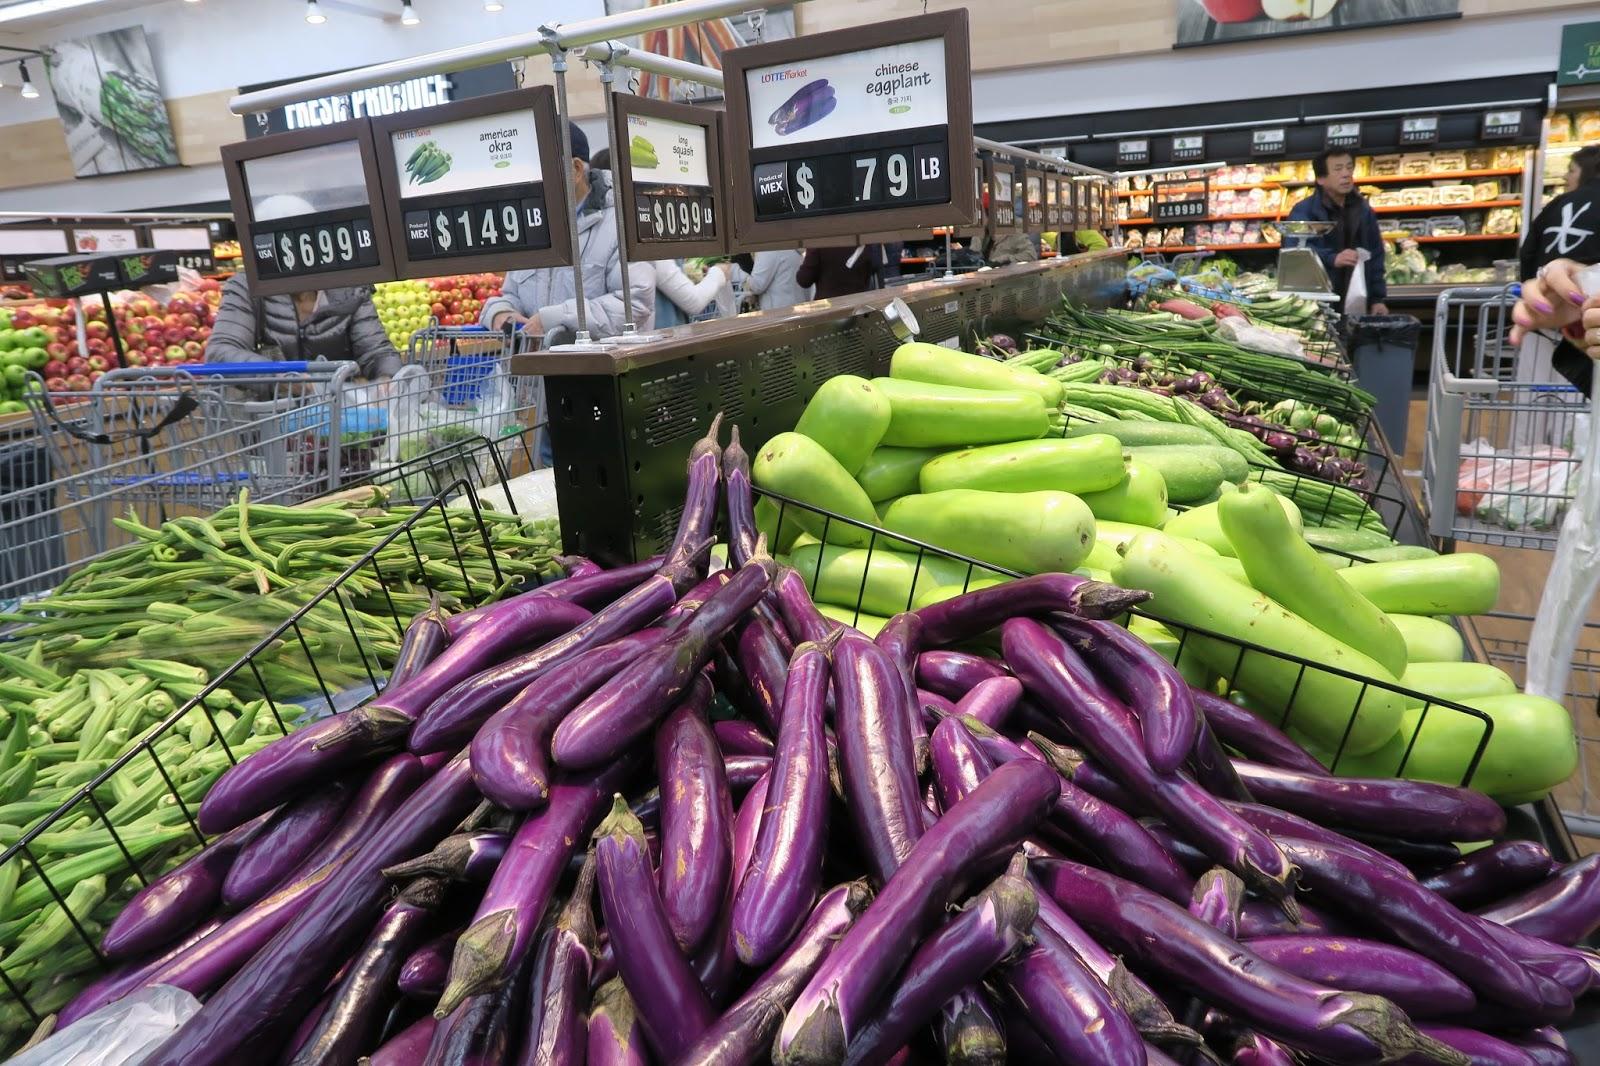 the Annandale Blog: Lotte Market opens in Ravensworth